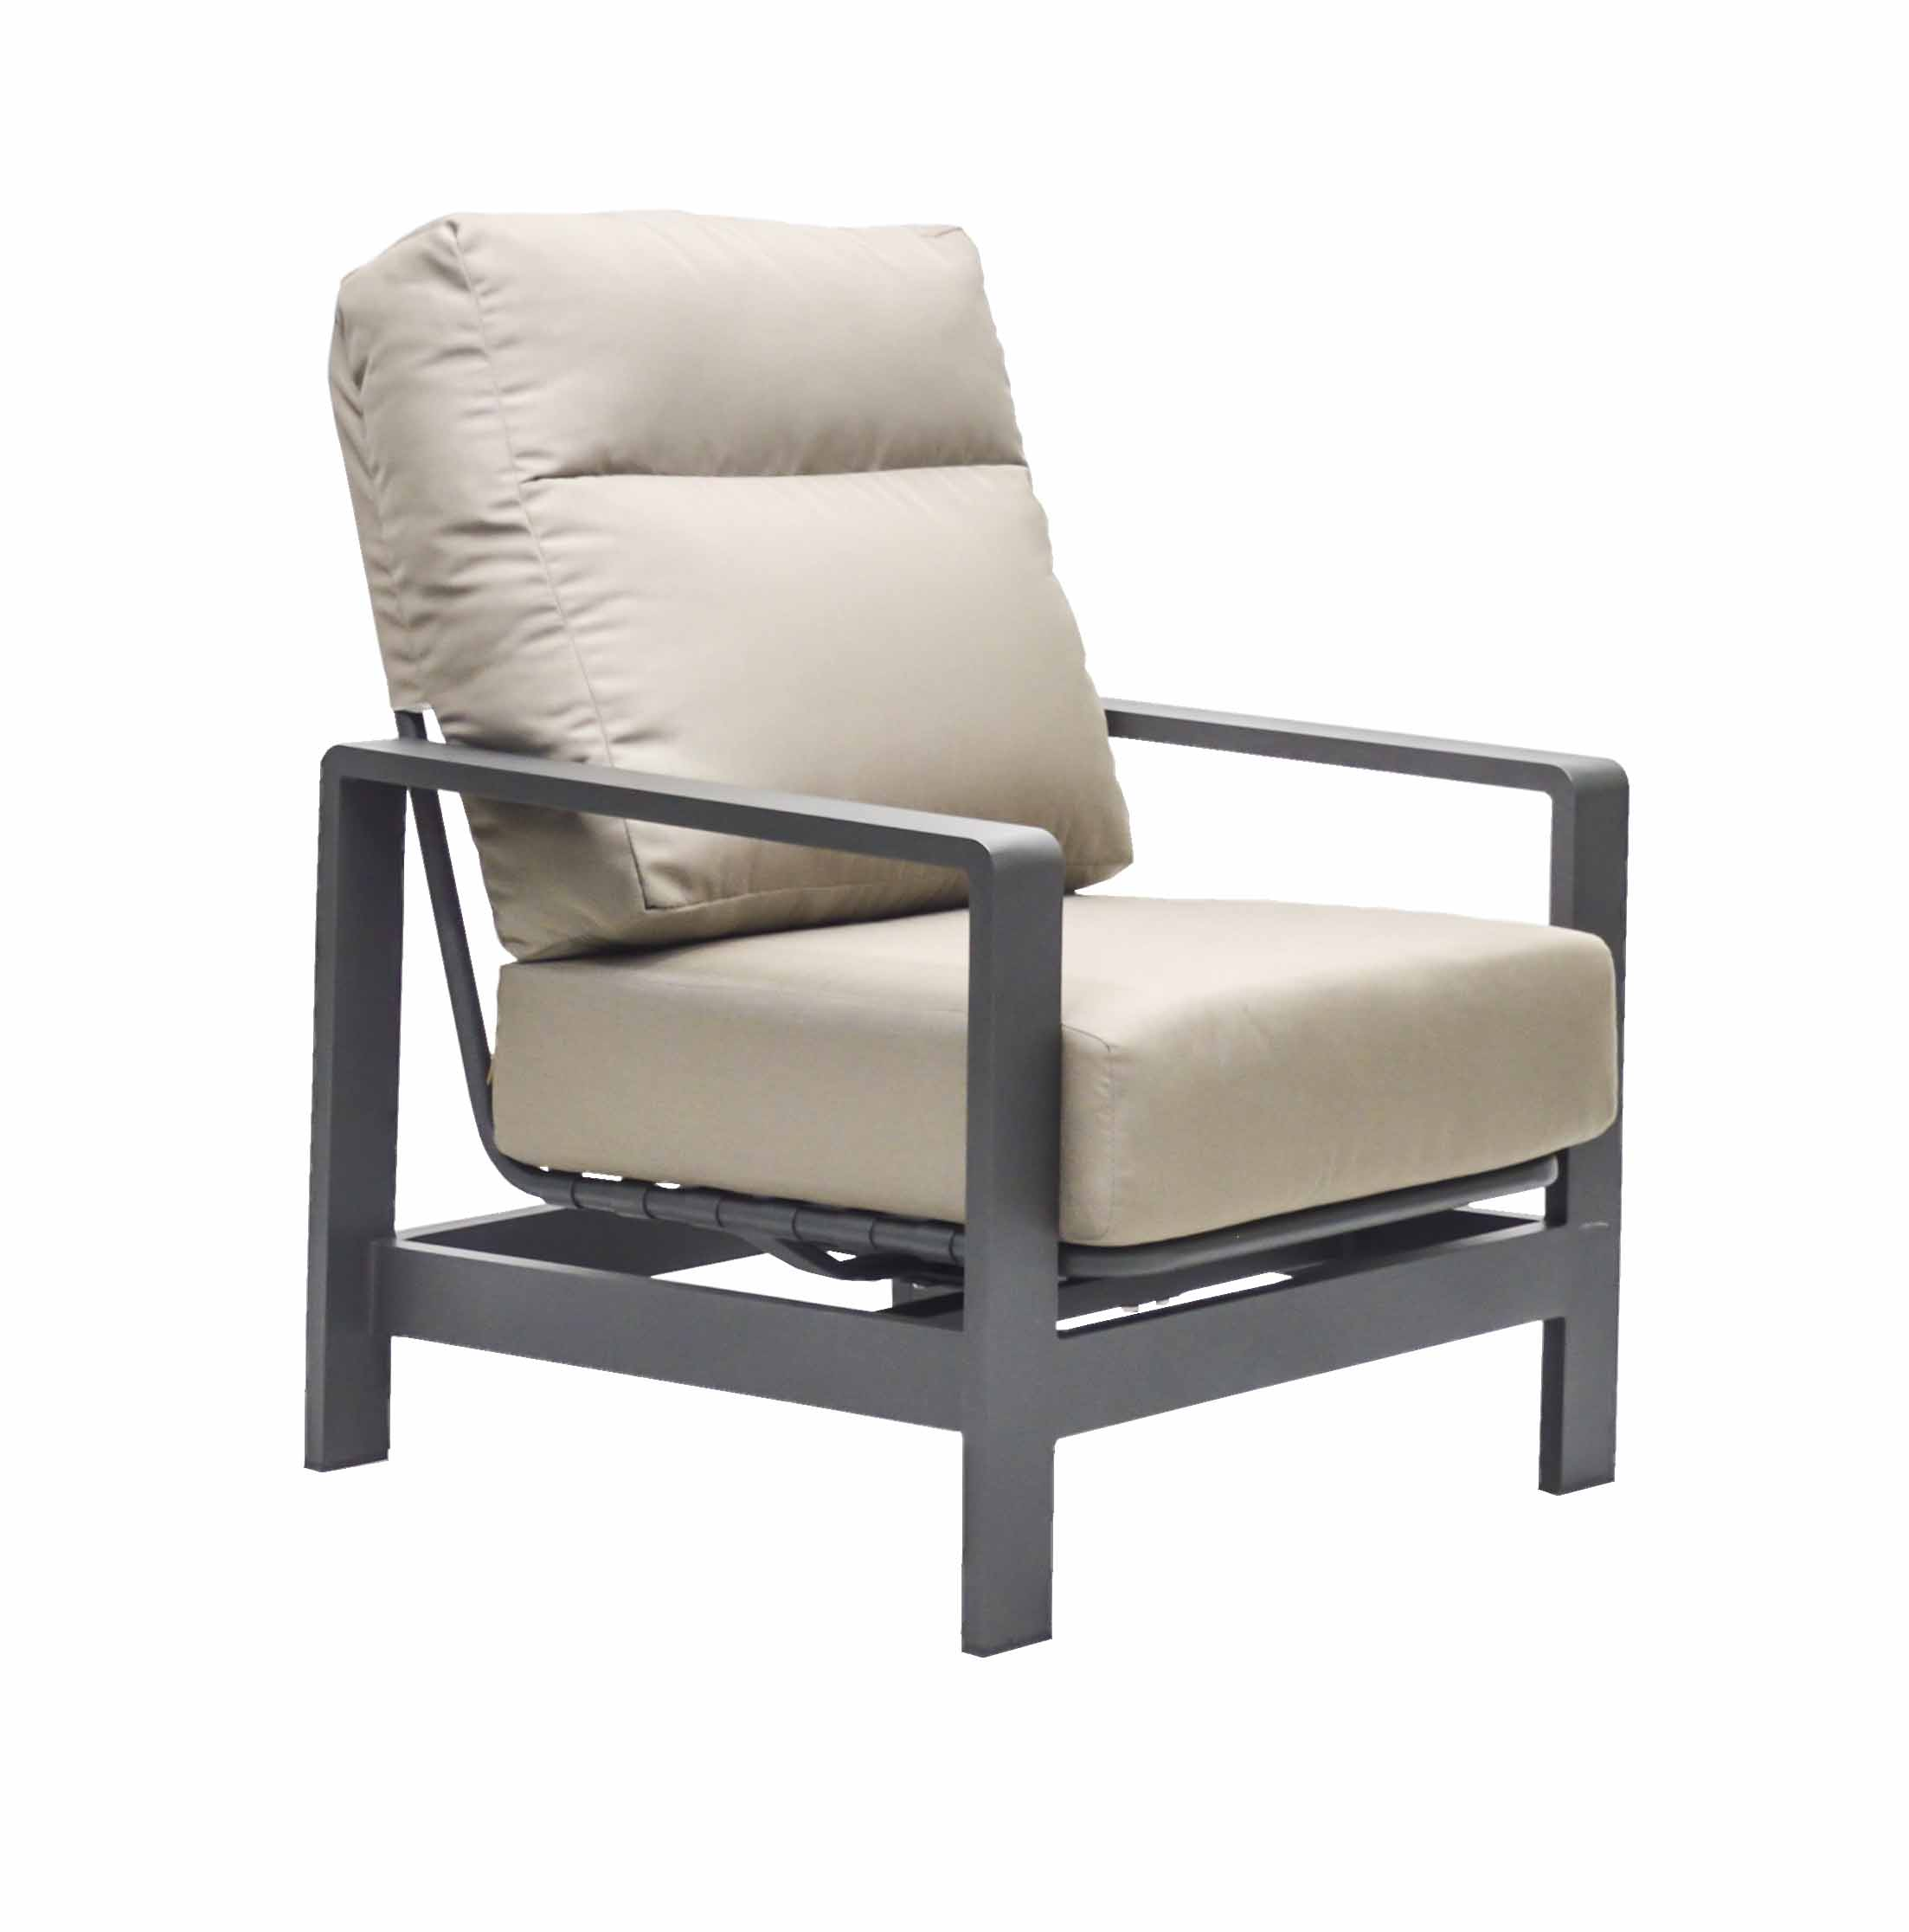 "976528 Covina Spring Chair   31"" x 35.2"" x 37.5"""